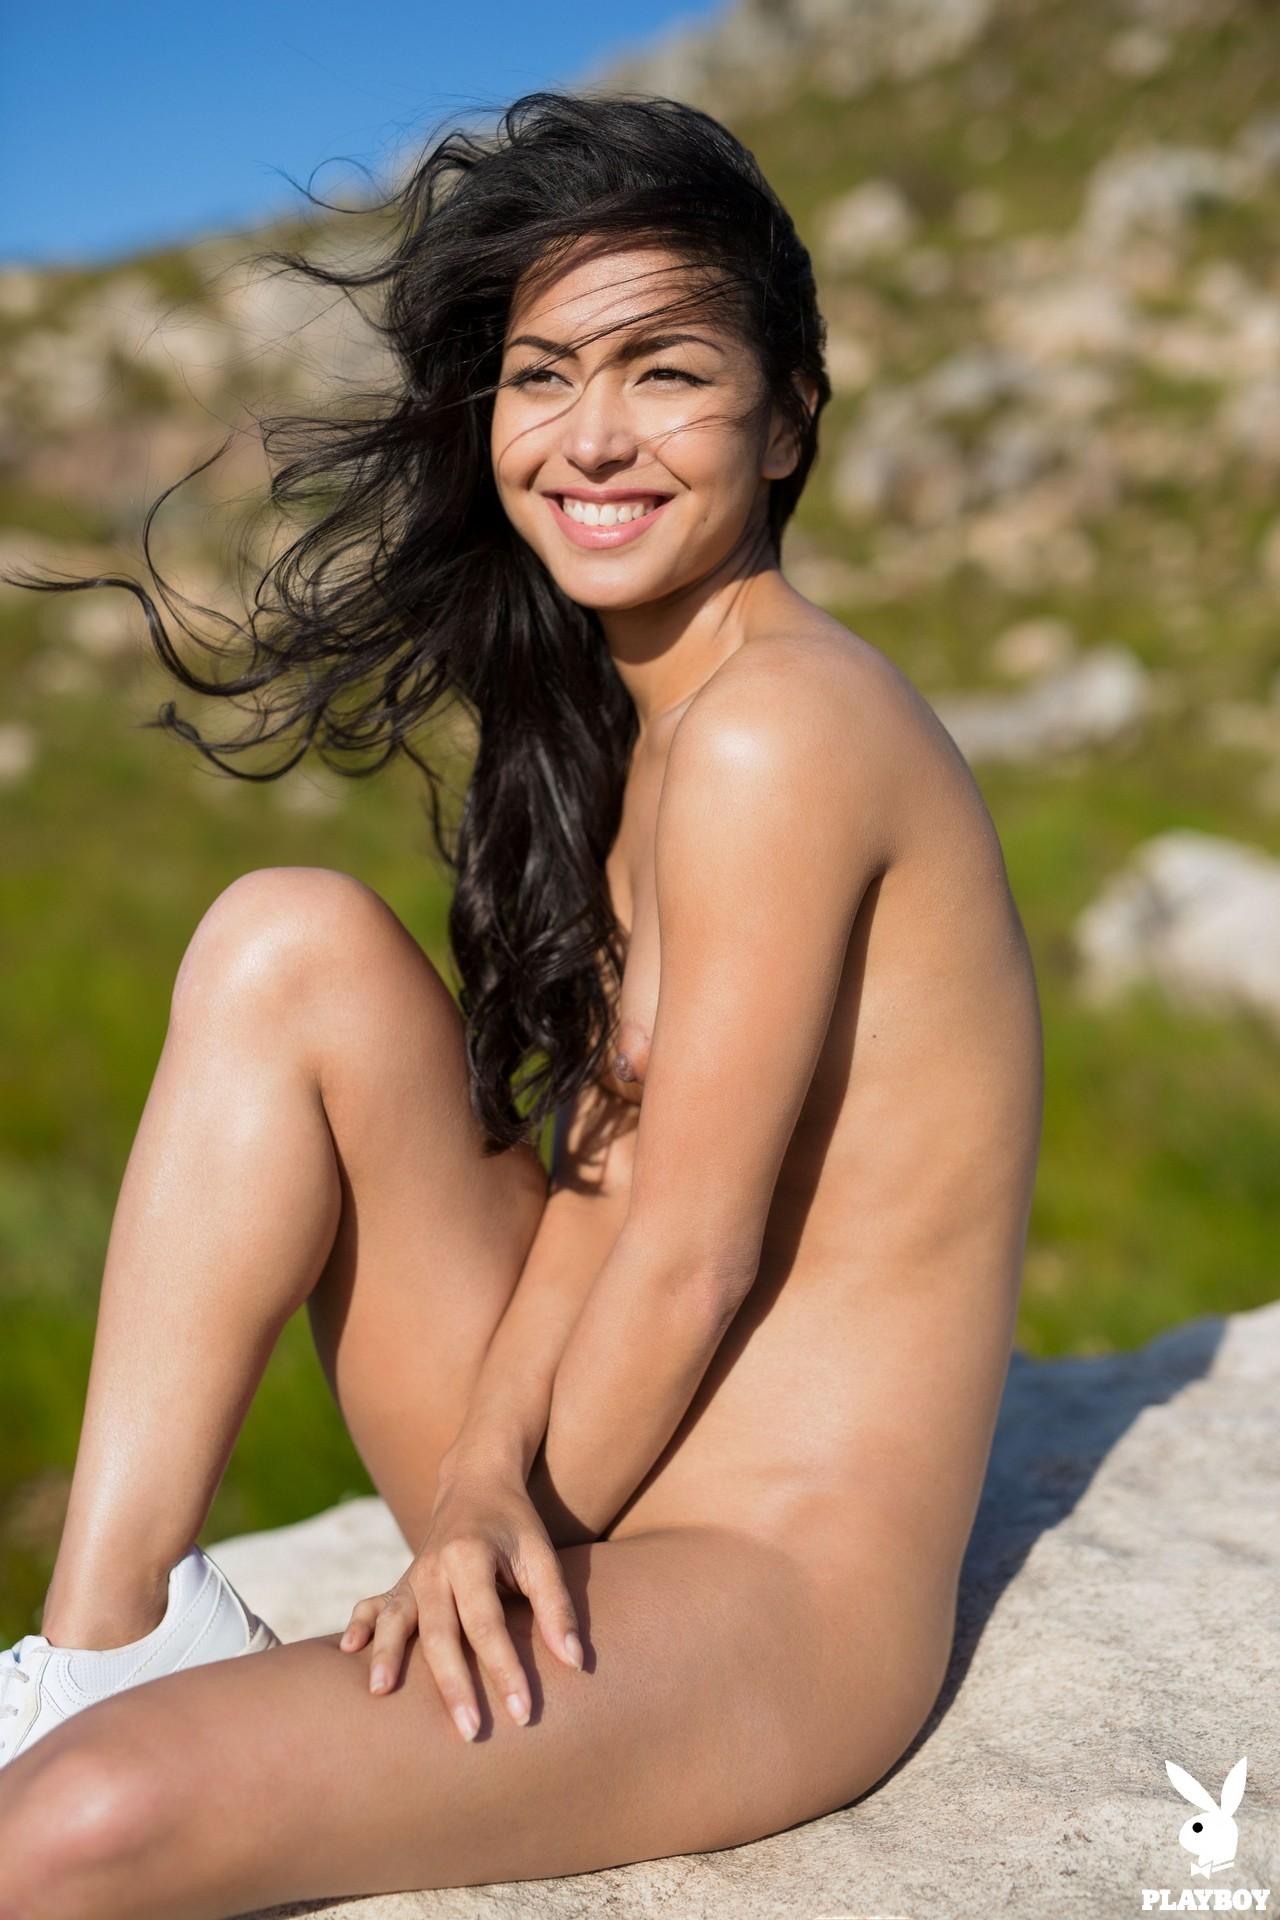 Chloe Rose in Trail Blazing 26